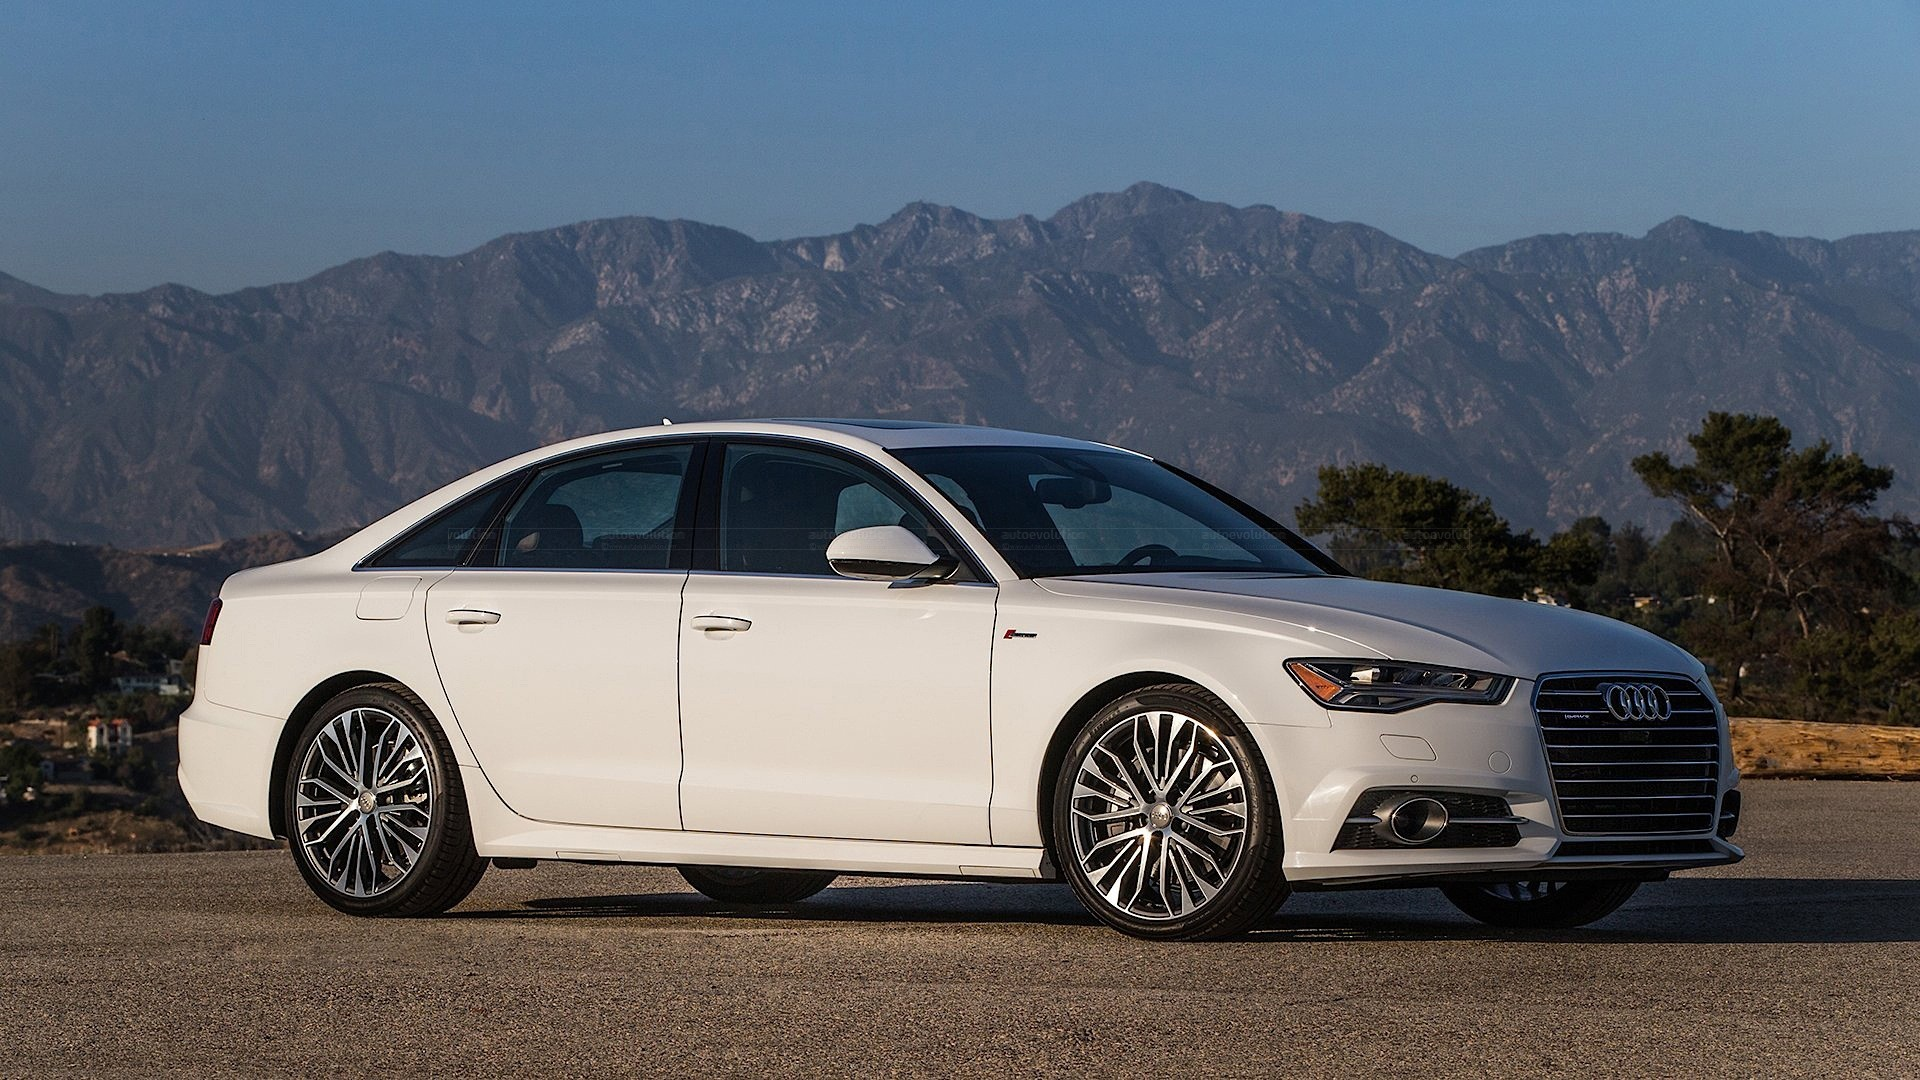 Audi Announces US-Spec Competition Models, A6 Starts at $67,600